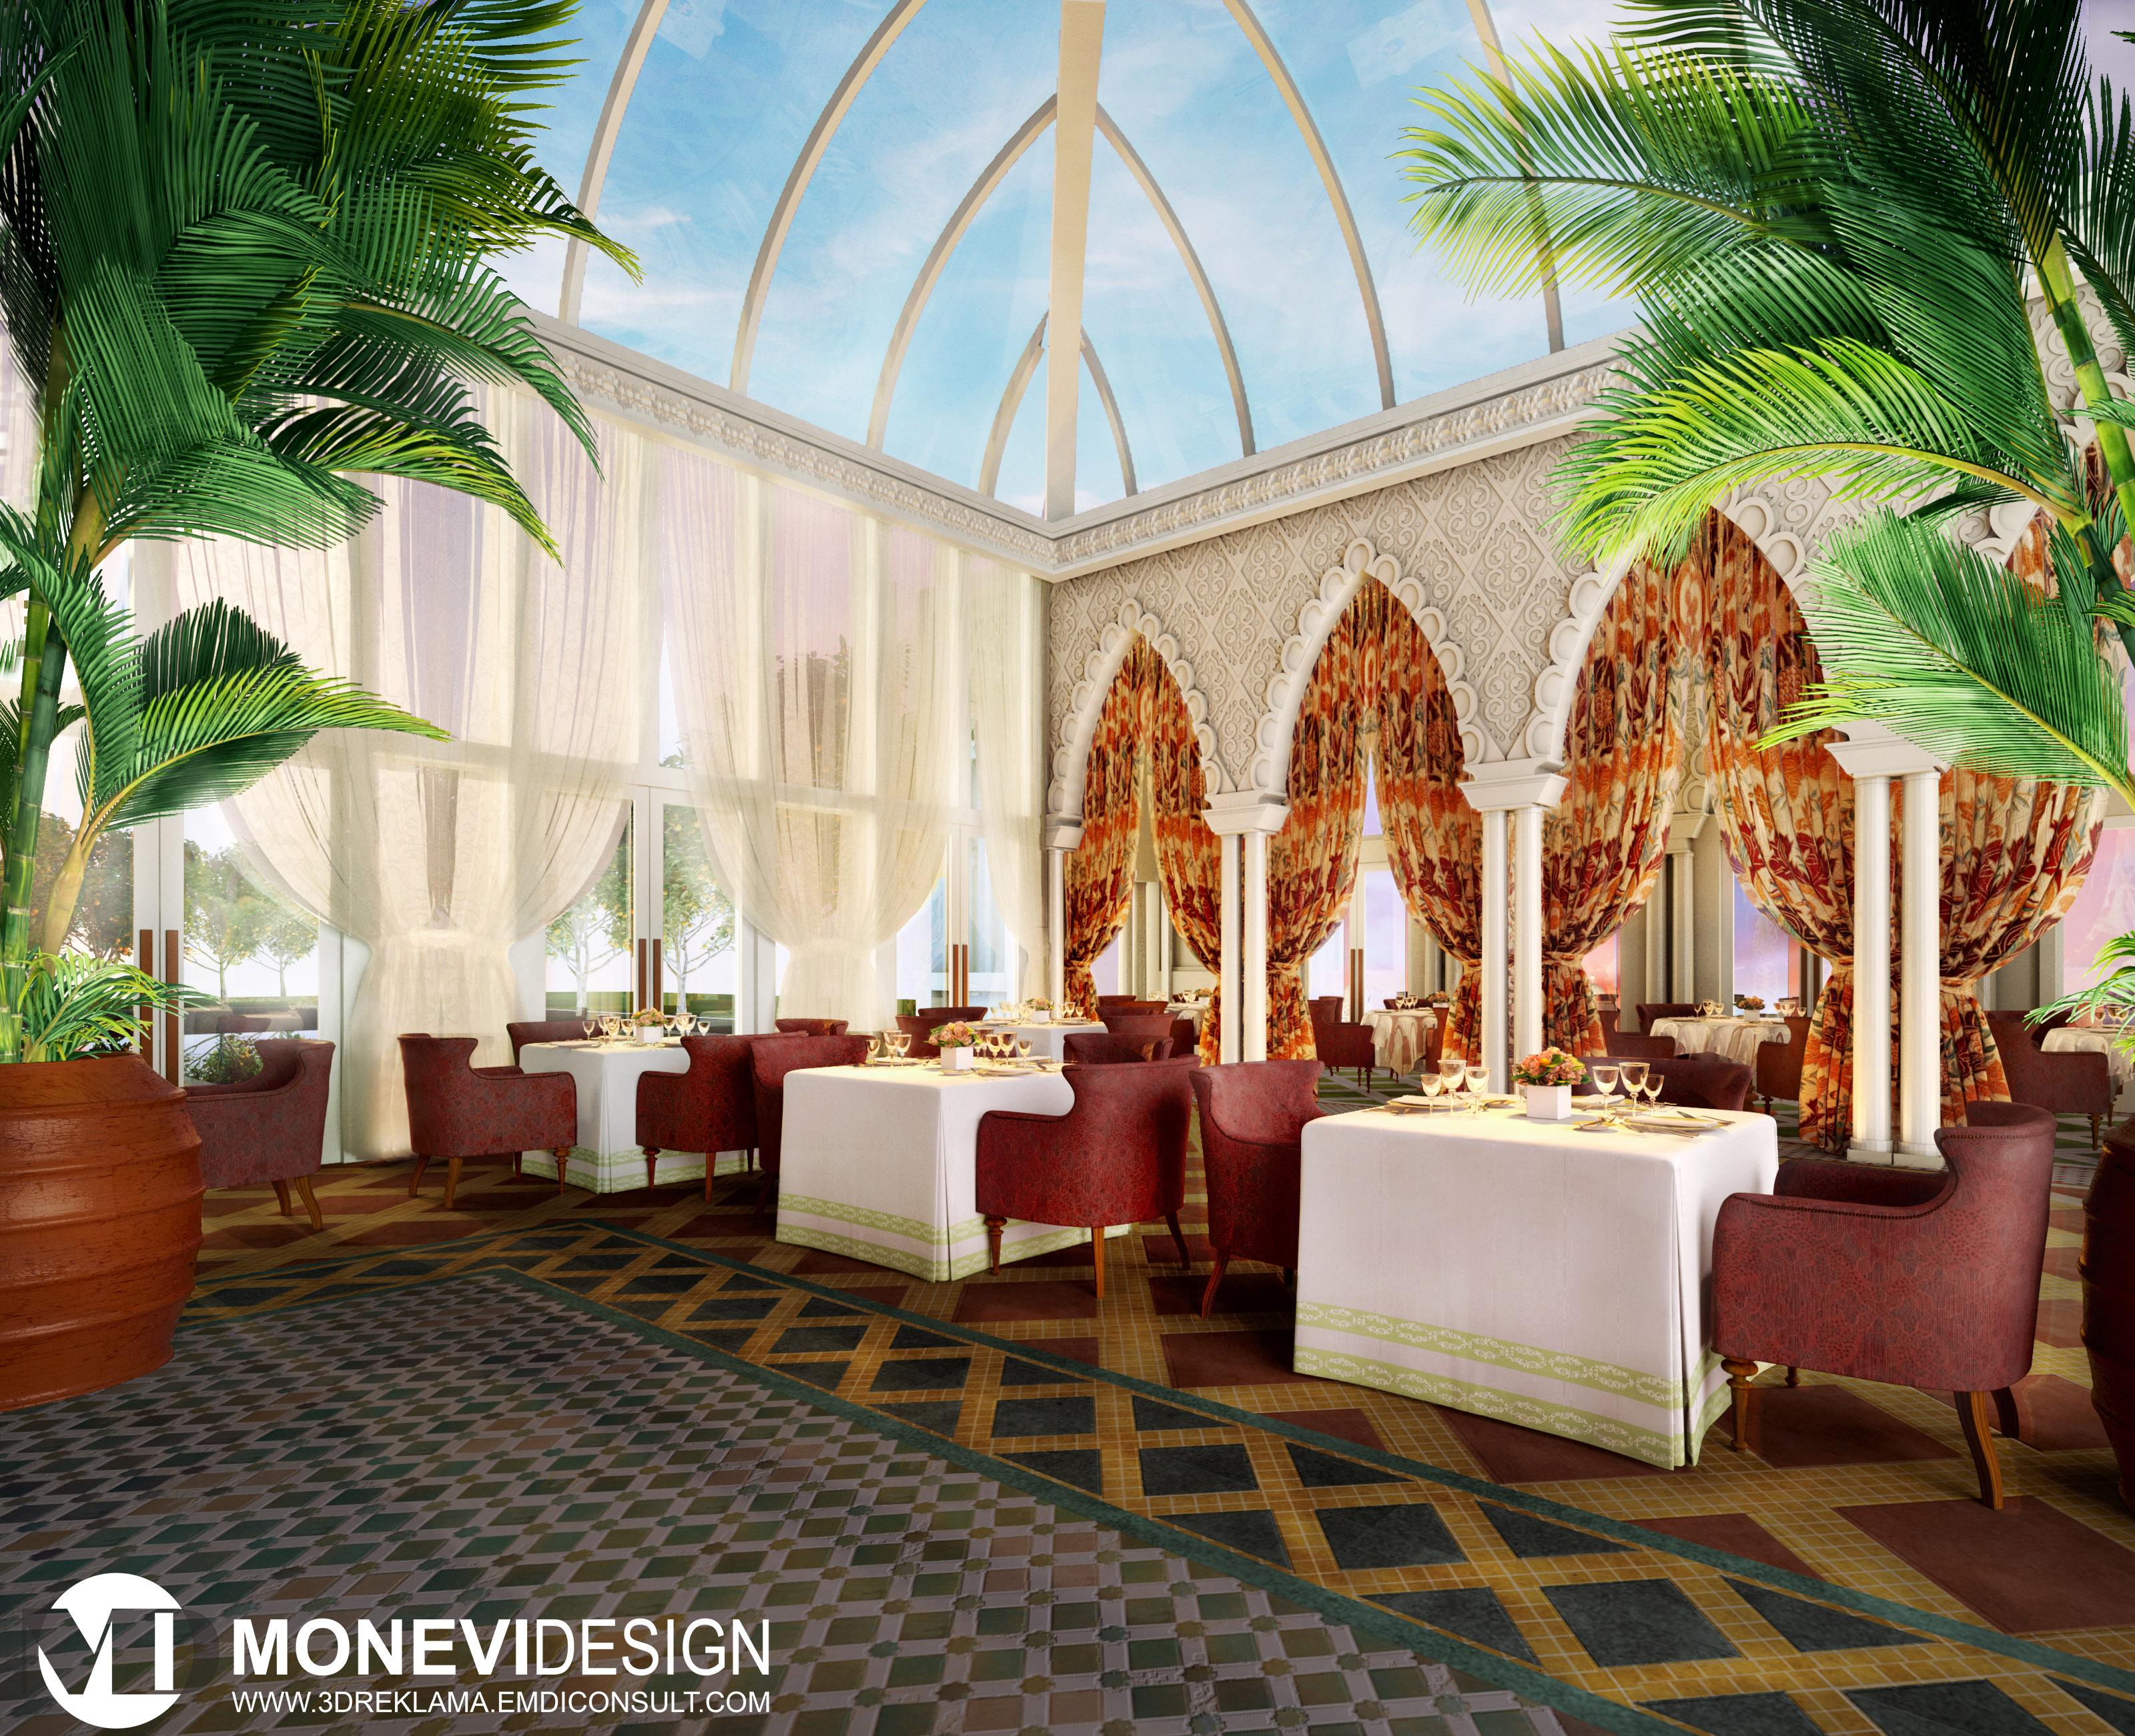 Morocco Restaurant Interior Design 3d Rendering Monevidesign